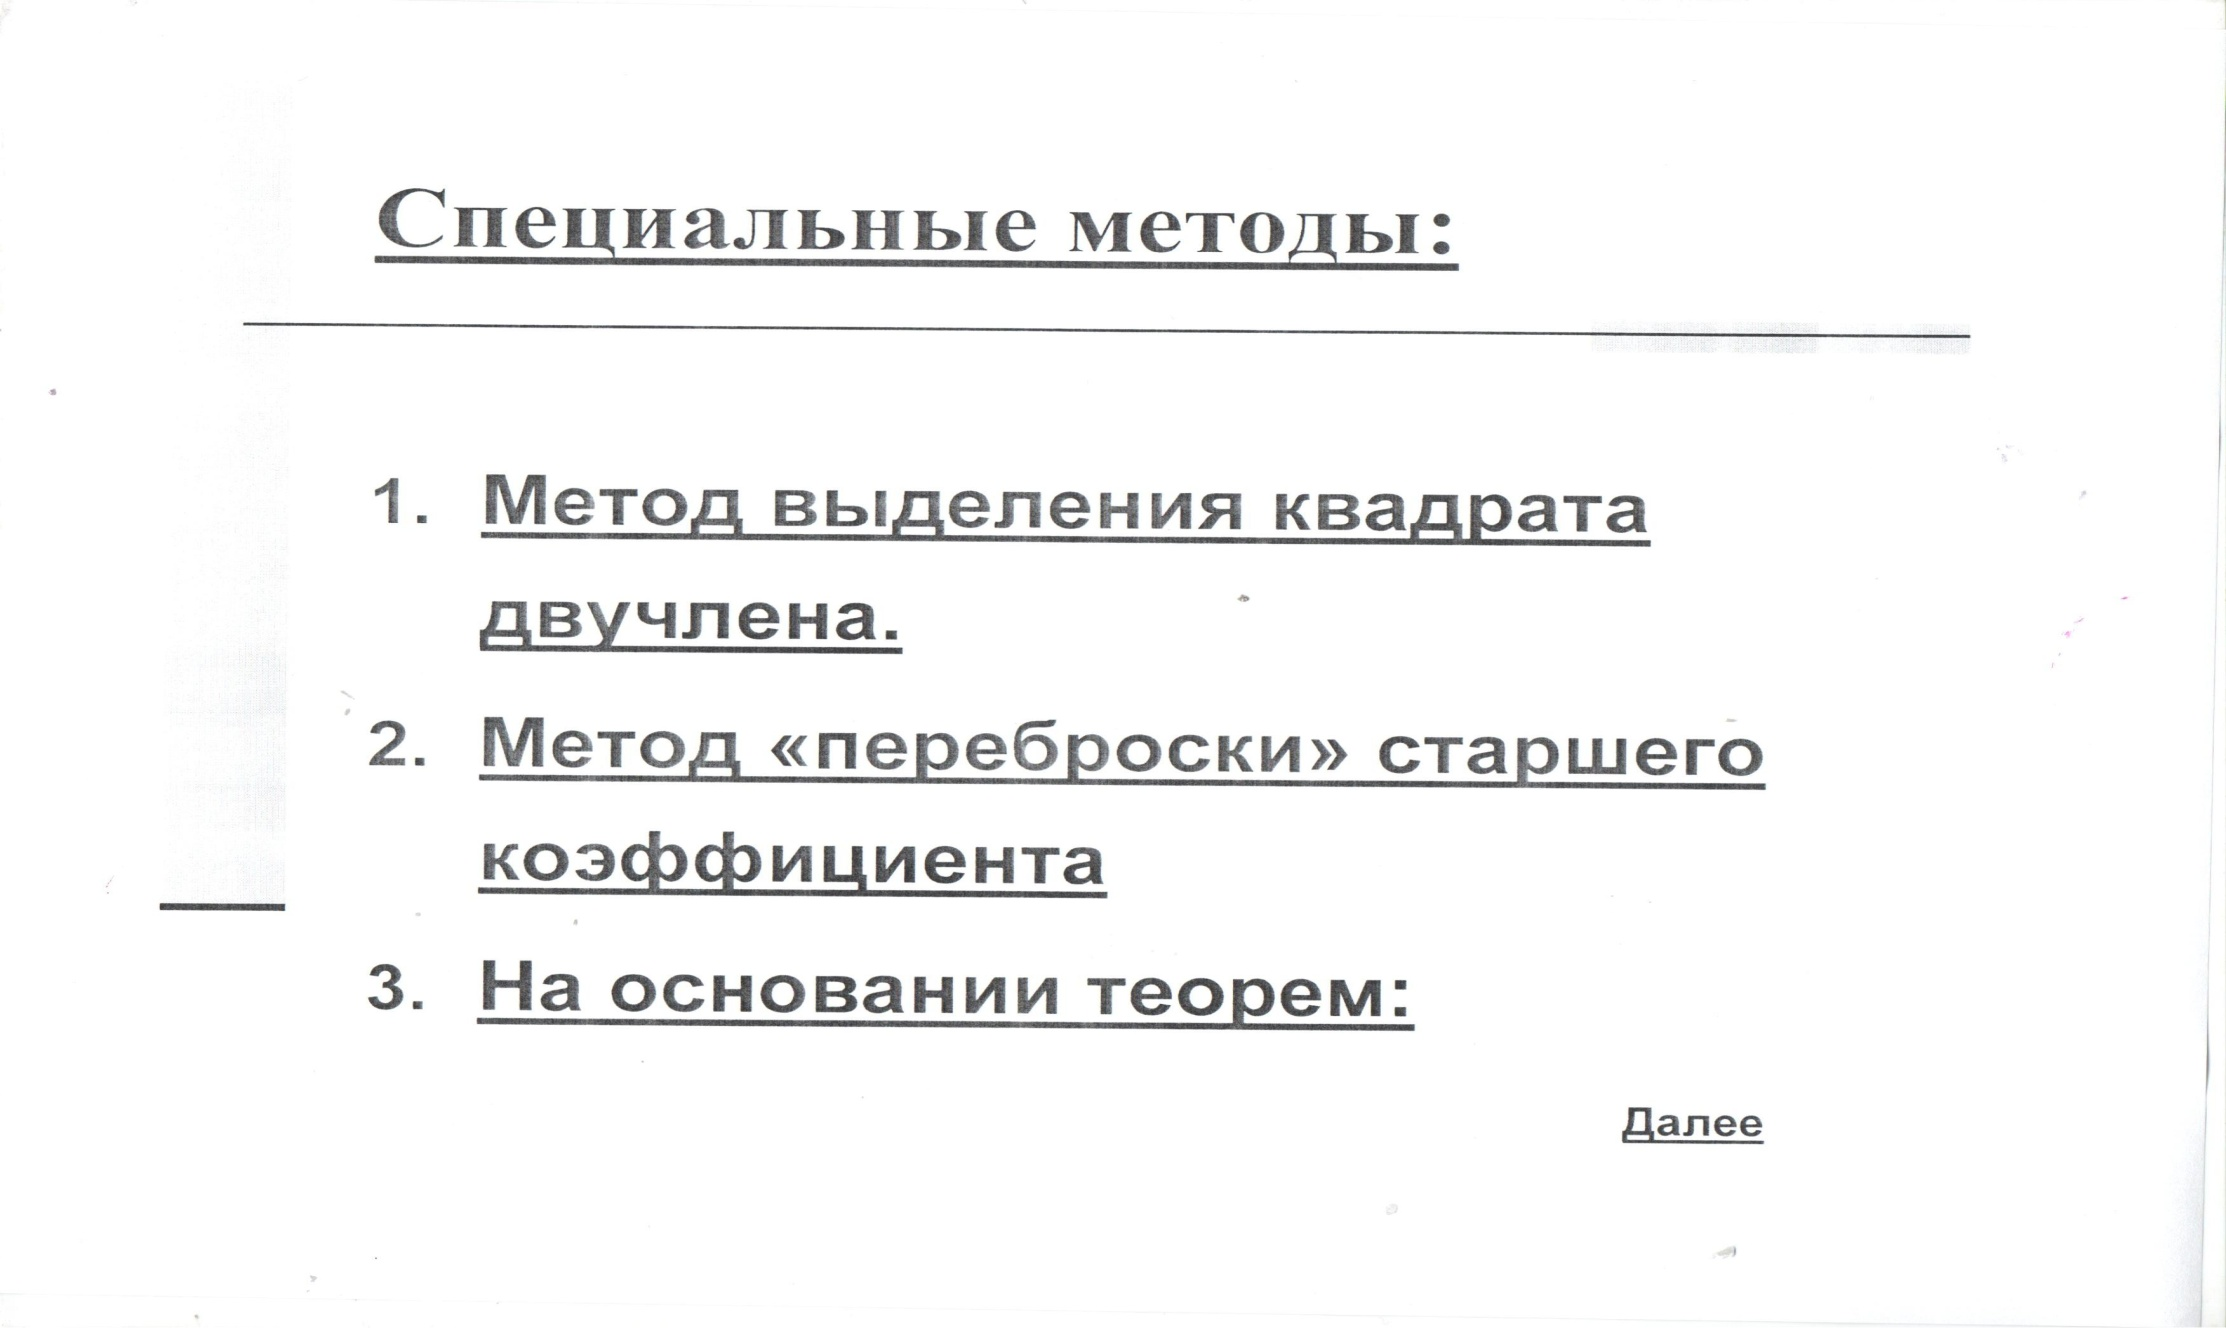 C:\Documents and Settings\Школа\Мои документы\Мои рисунки\Изображение\Изображение 026.jpg